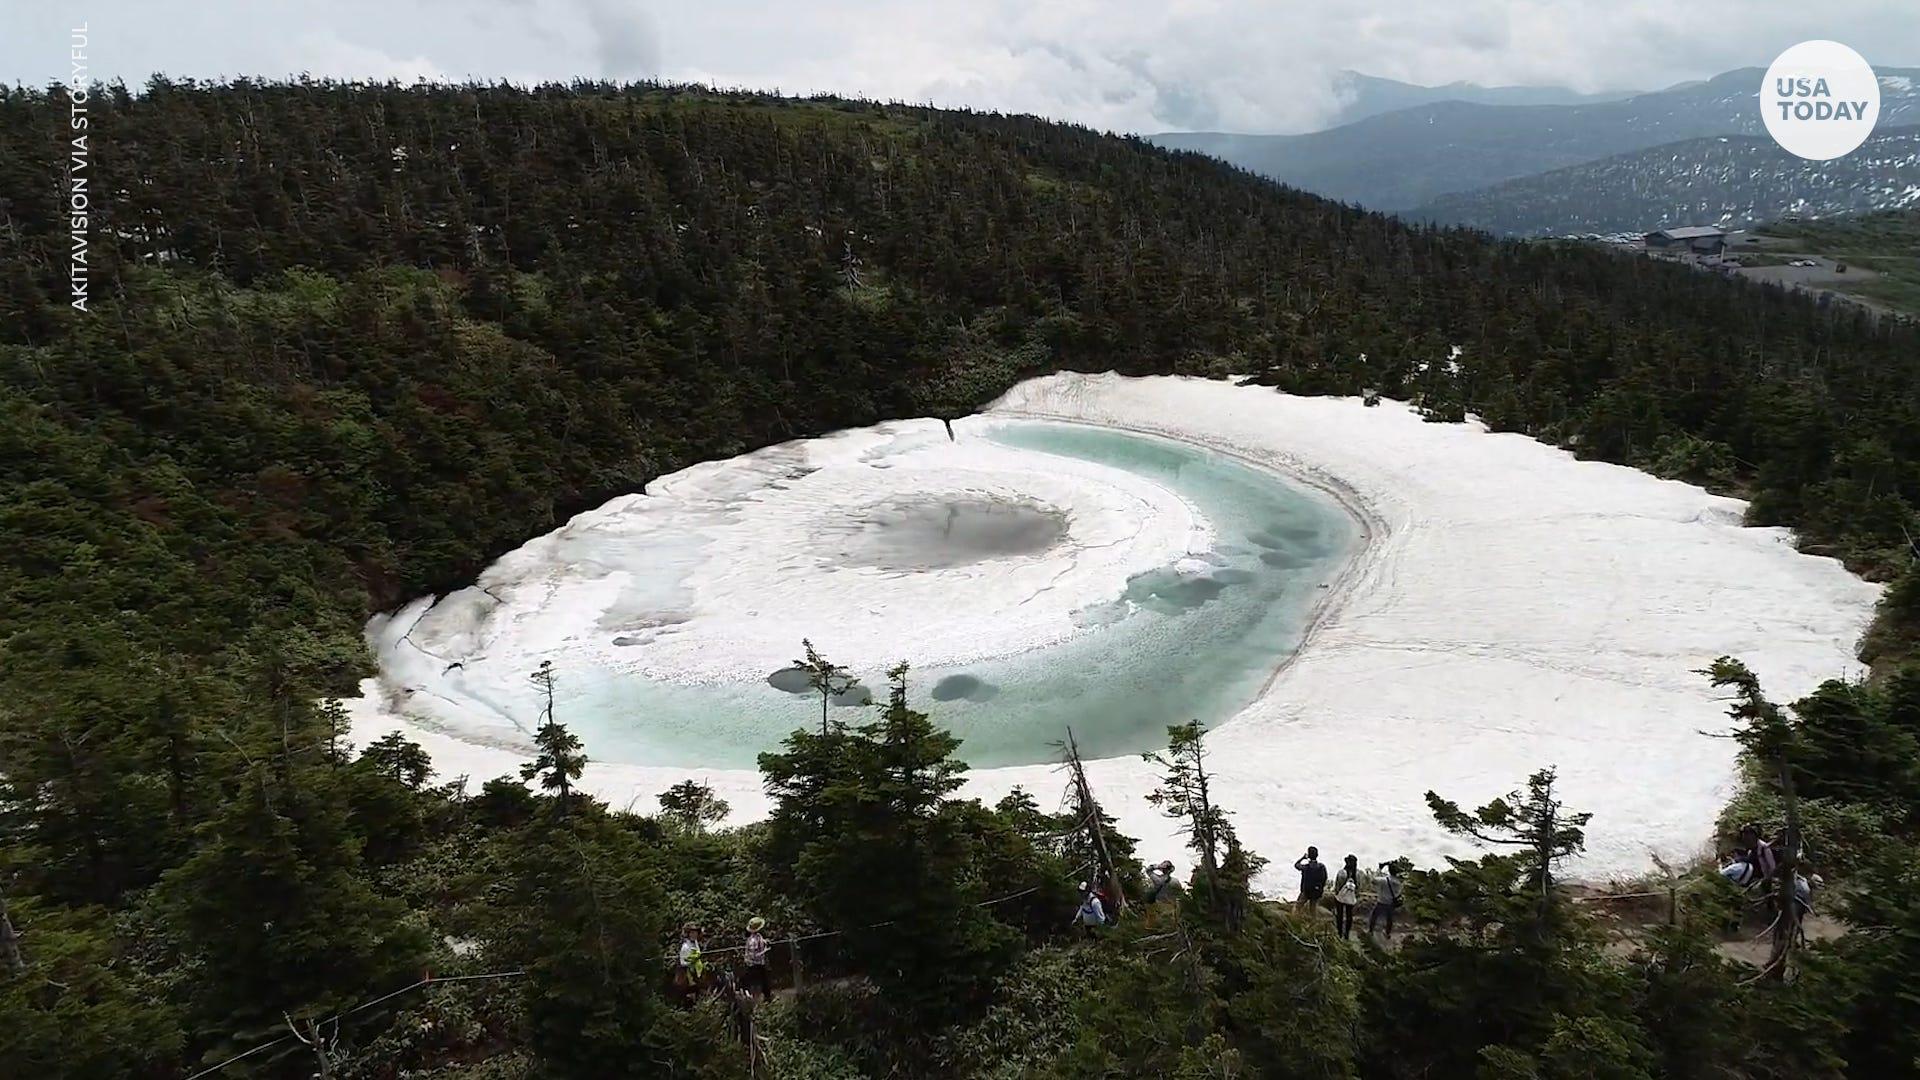 melting ice reveals japan u0026 39 s breathtaking  u0026 39 dragon eye u0026 39  pond